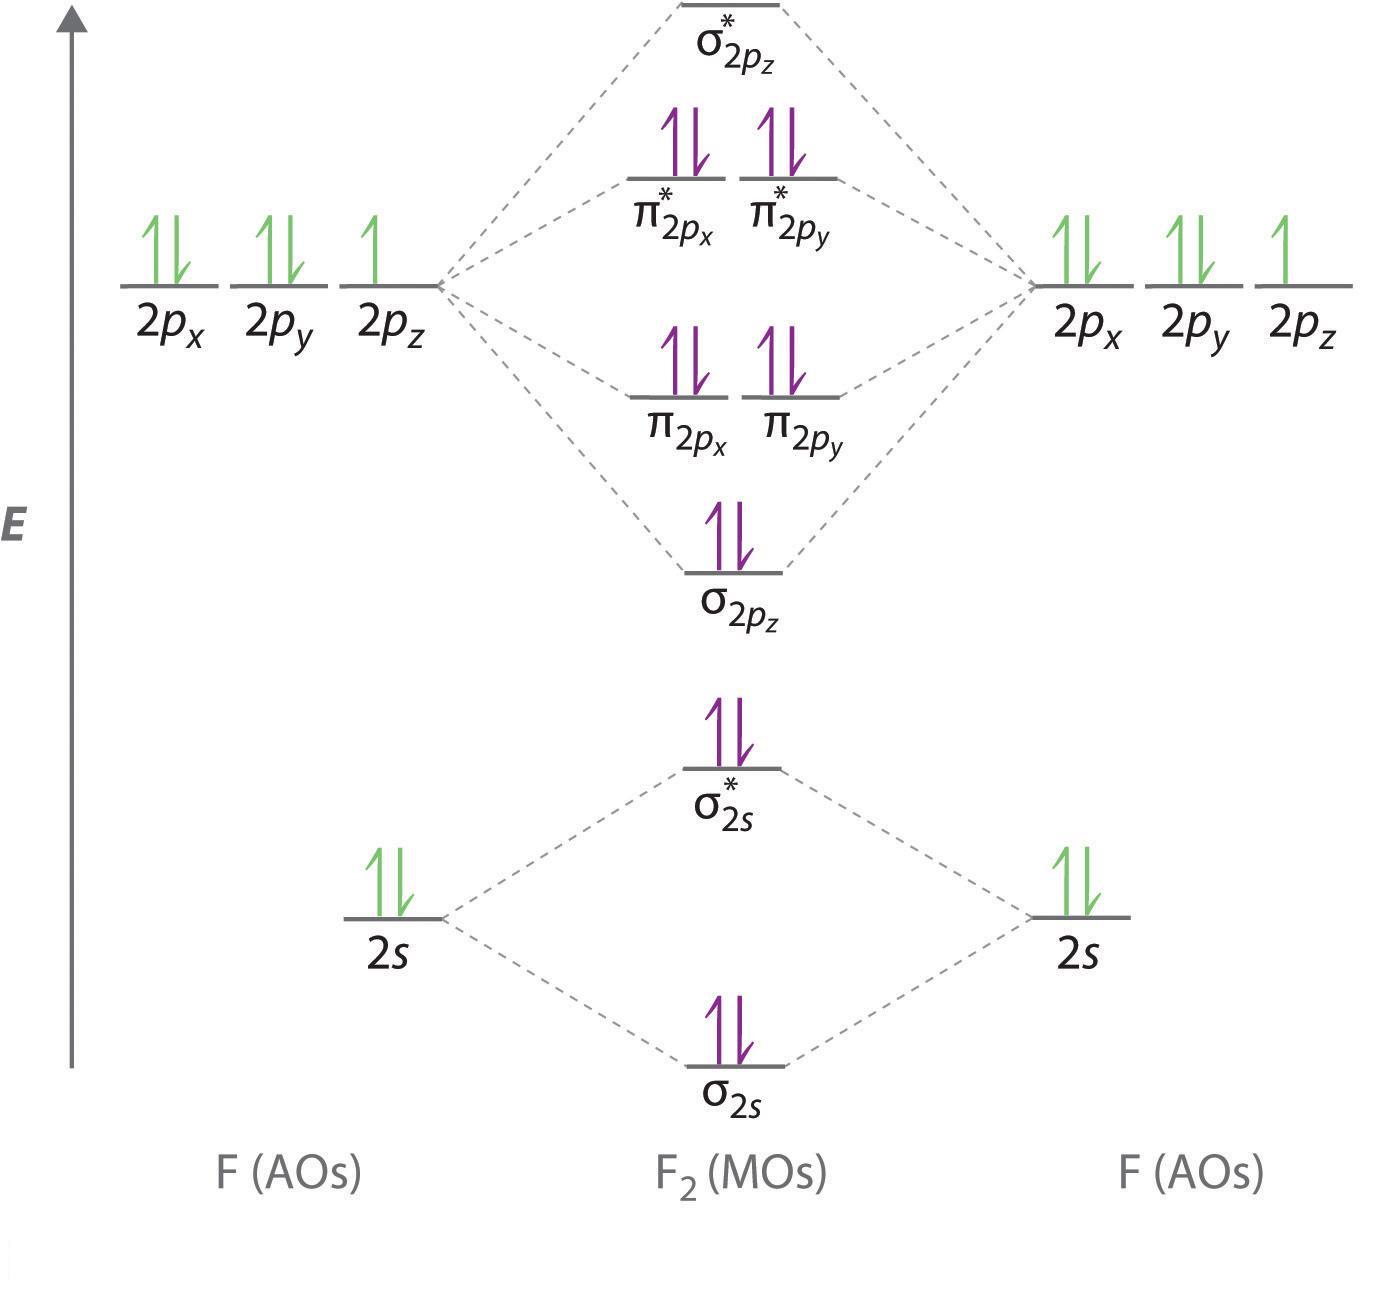 http://chemwiki.ucdavis.edu/Wikitexts/UC_Davis/UCD_Chem_2A/UCD_Chem_2A%3A_Hayashi